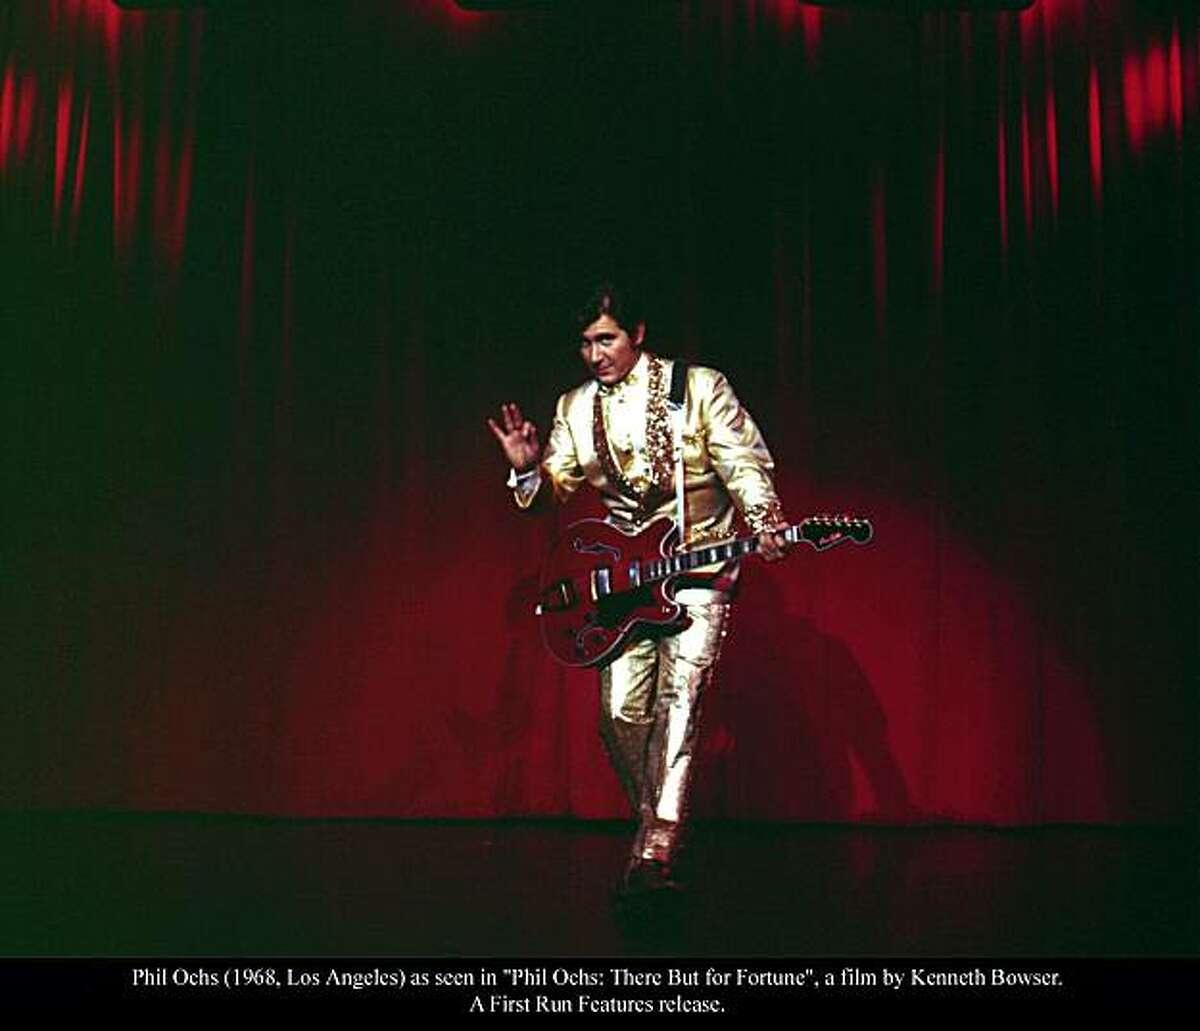 Phil Ochs (1968, Los Angeles) as seen in